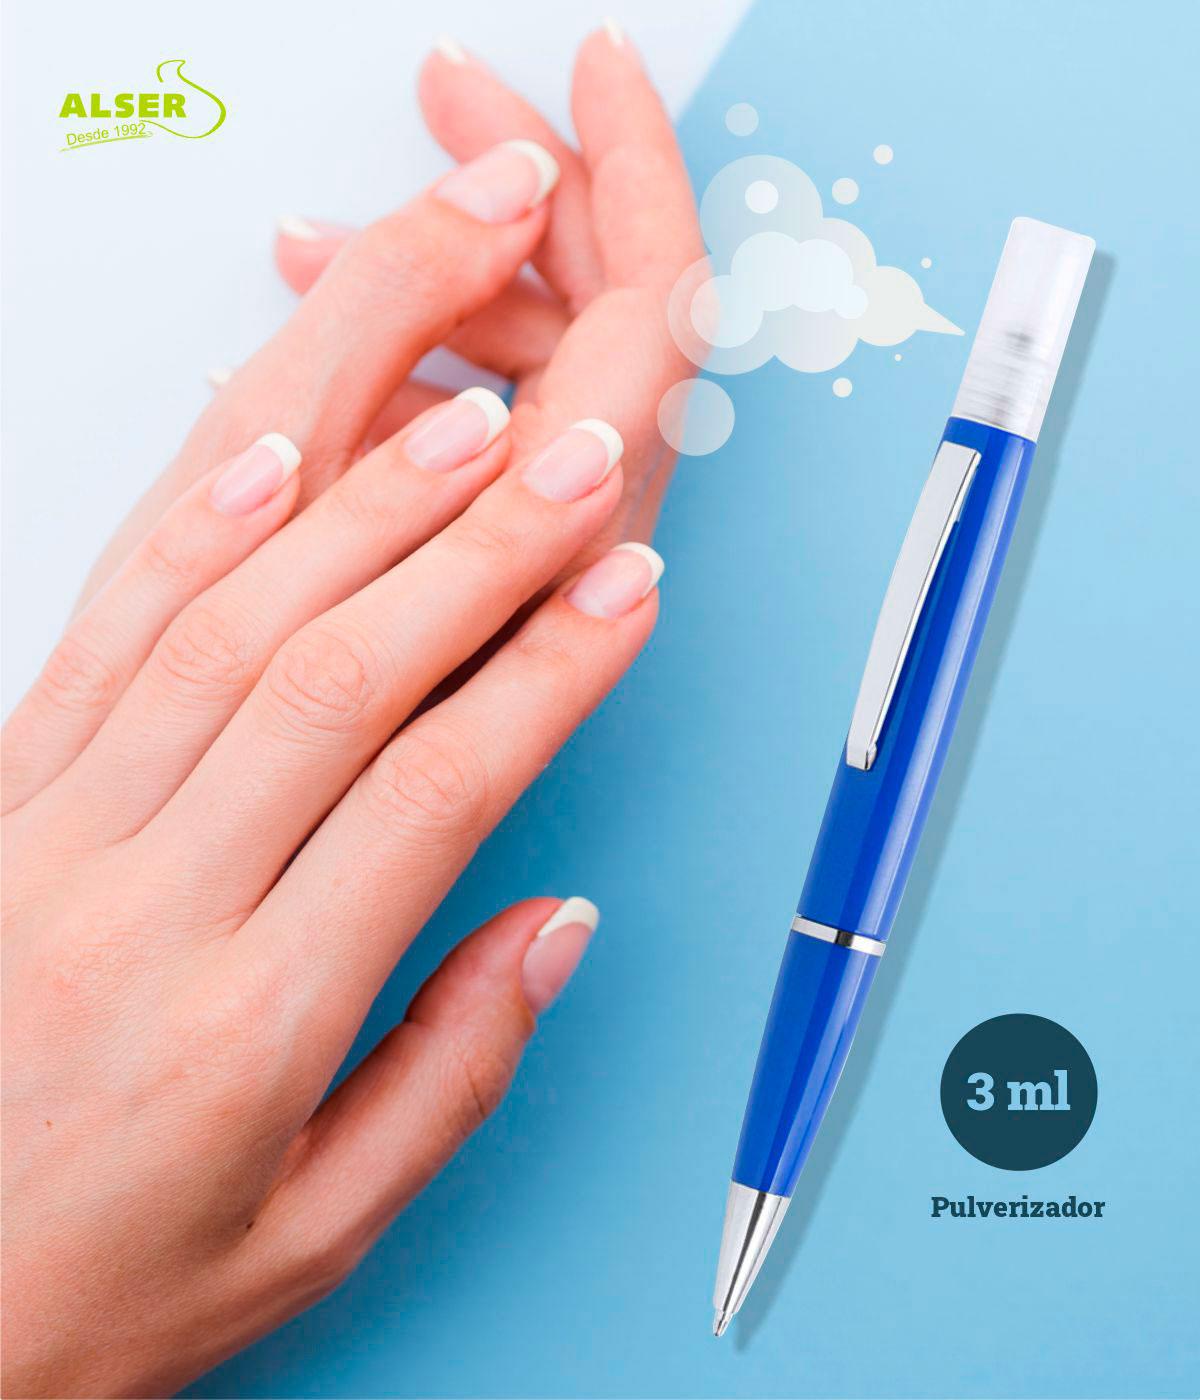 Boligrafo spray para higienizar manos